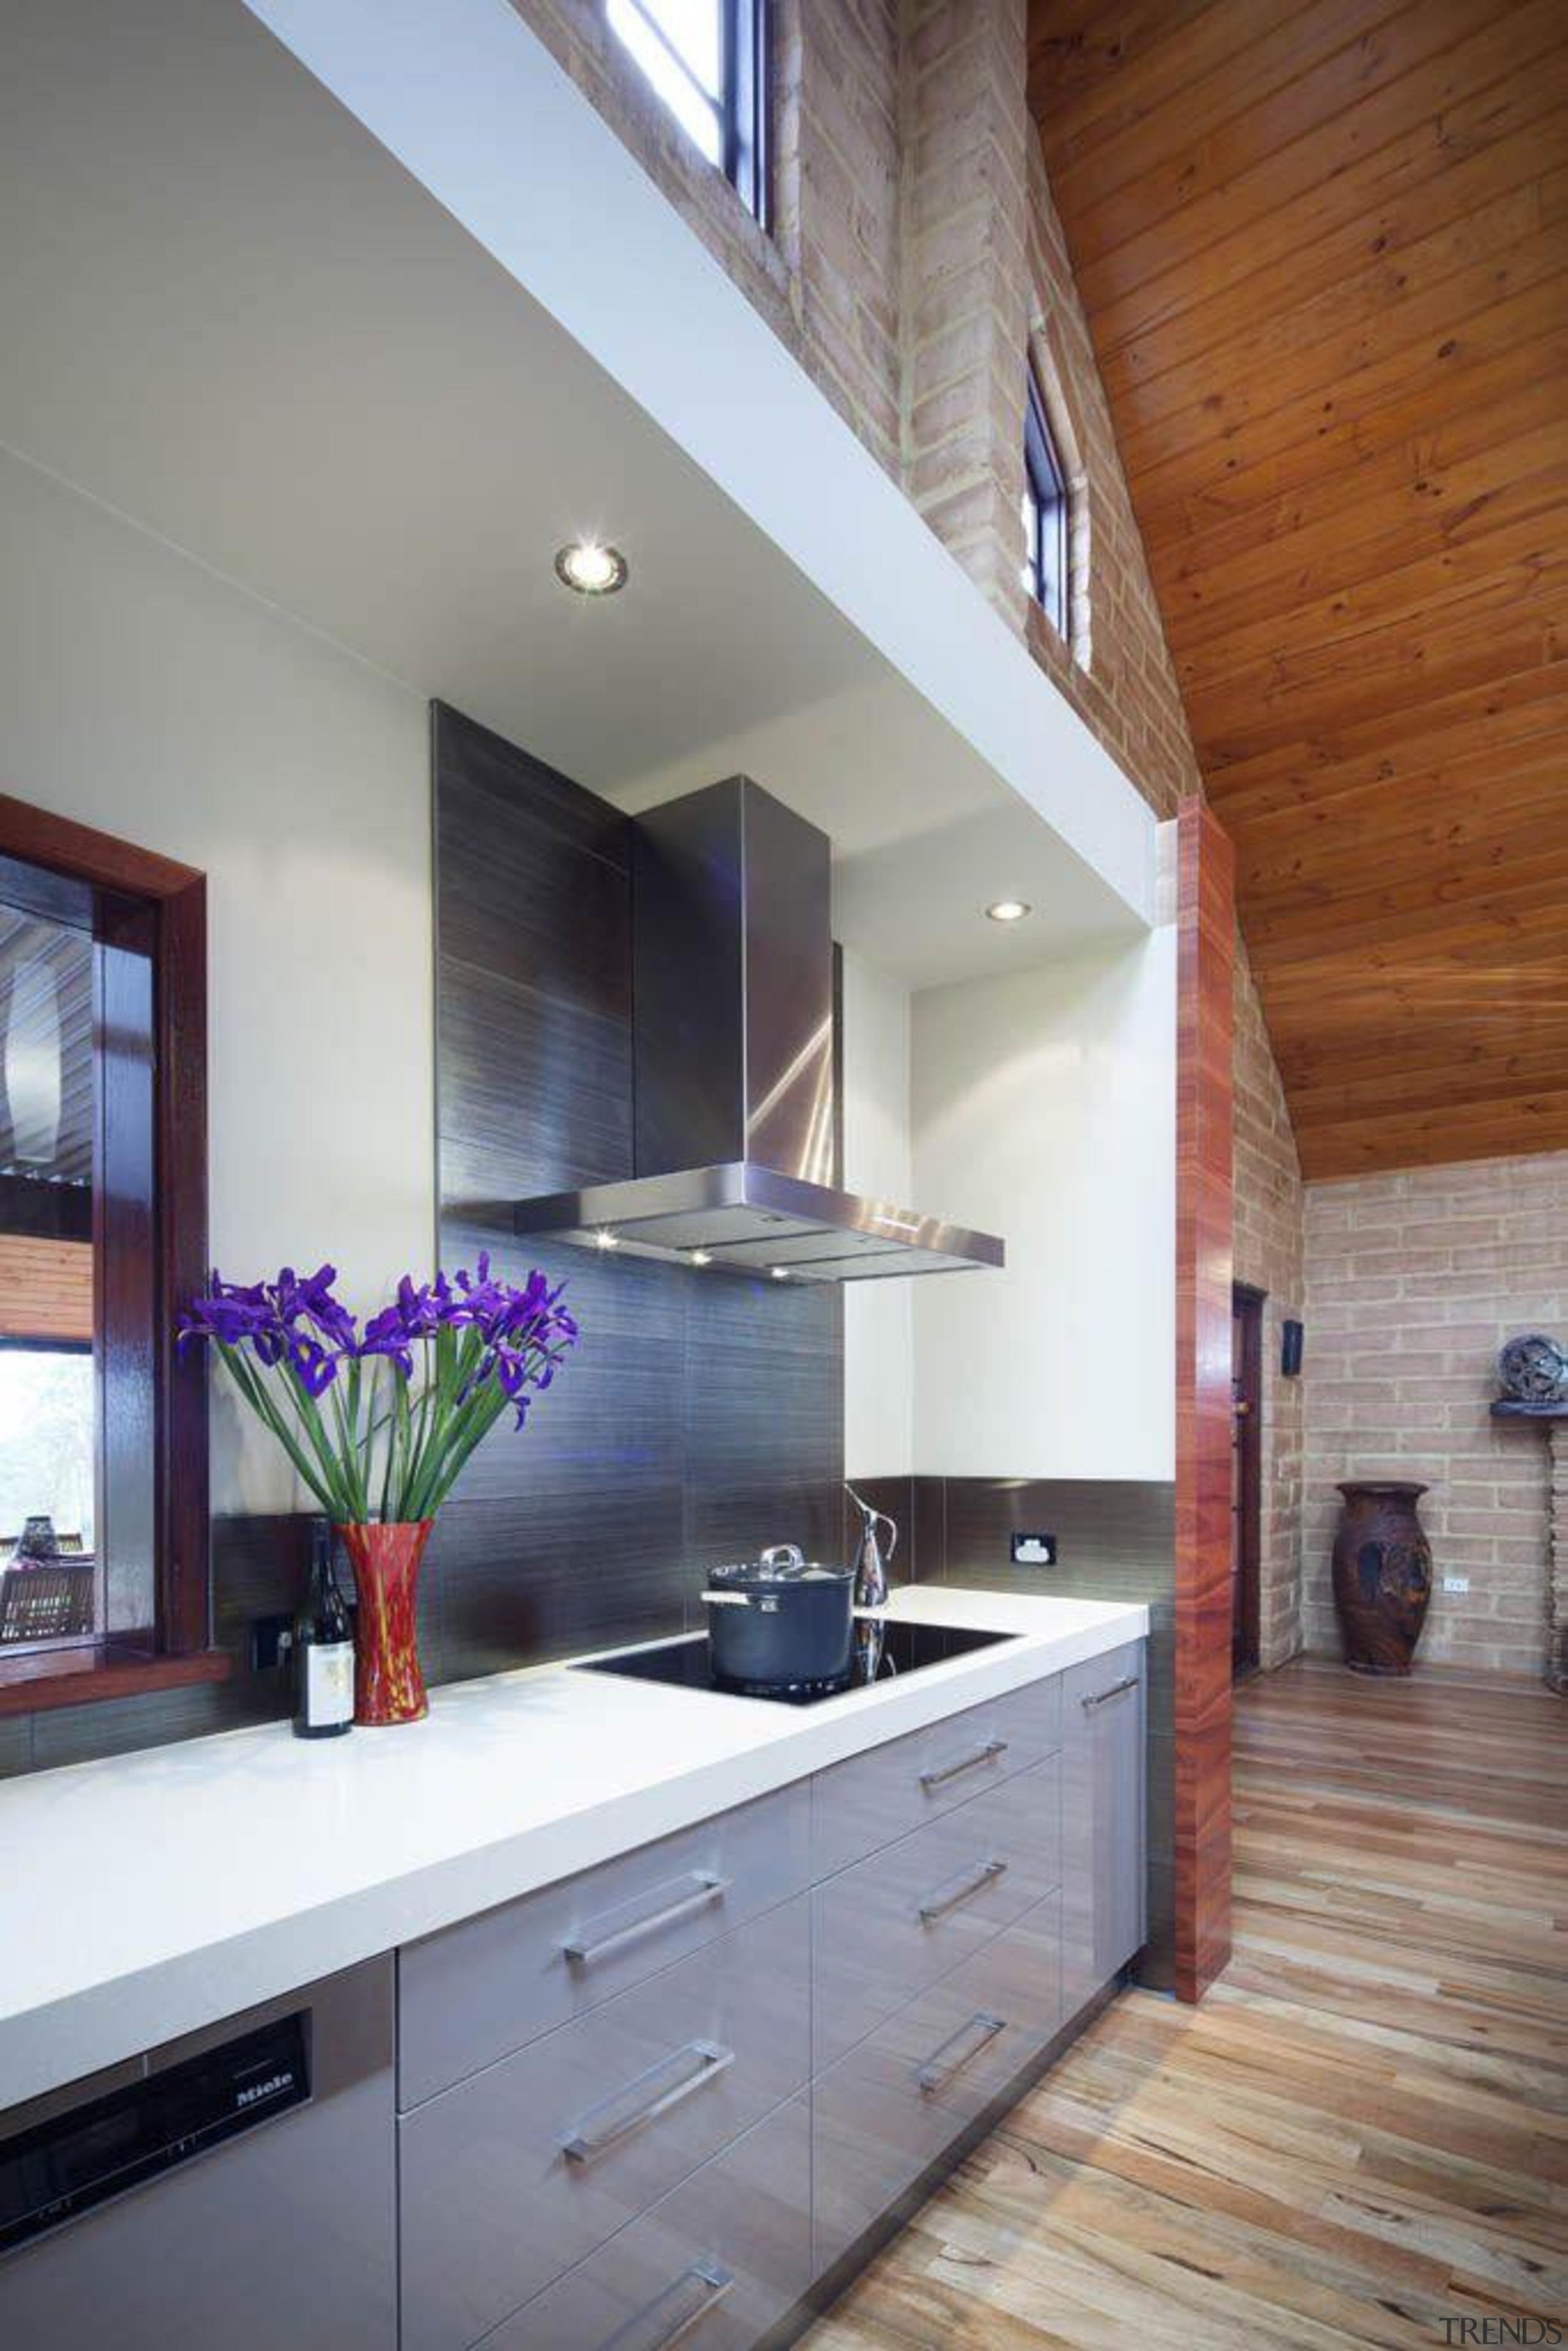 Alternative Kitchen Company Buttermilk - Buttermilk™ - architecture architecture, cabinetry, ceiling, countertop, daylighting, home, house, interior design, kitchen, real estate, room, gray